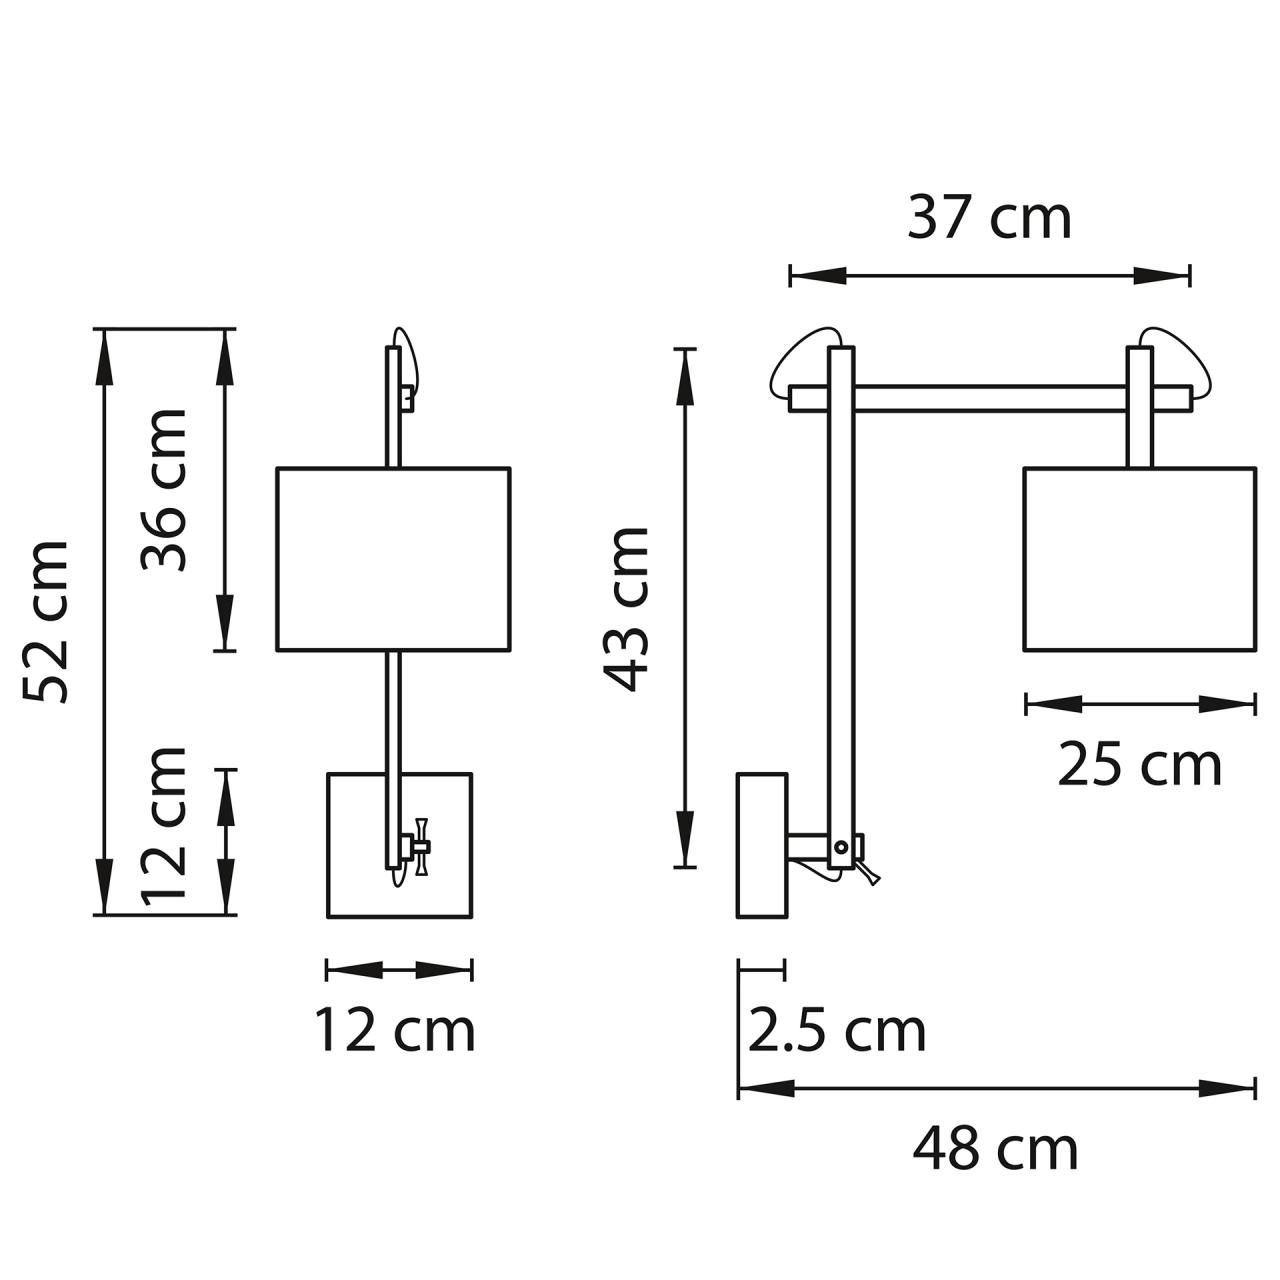 Бра MECCANO 1х60W E27 хром / белый ткань Lightstar 766619